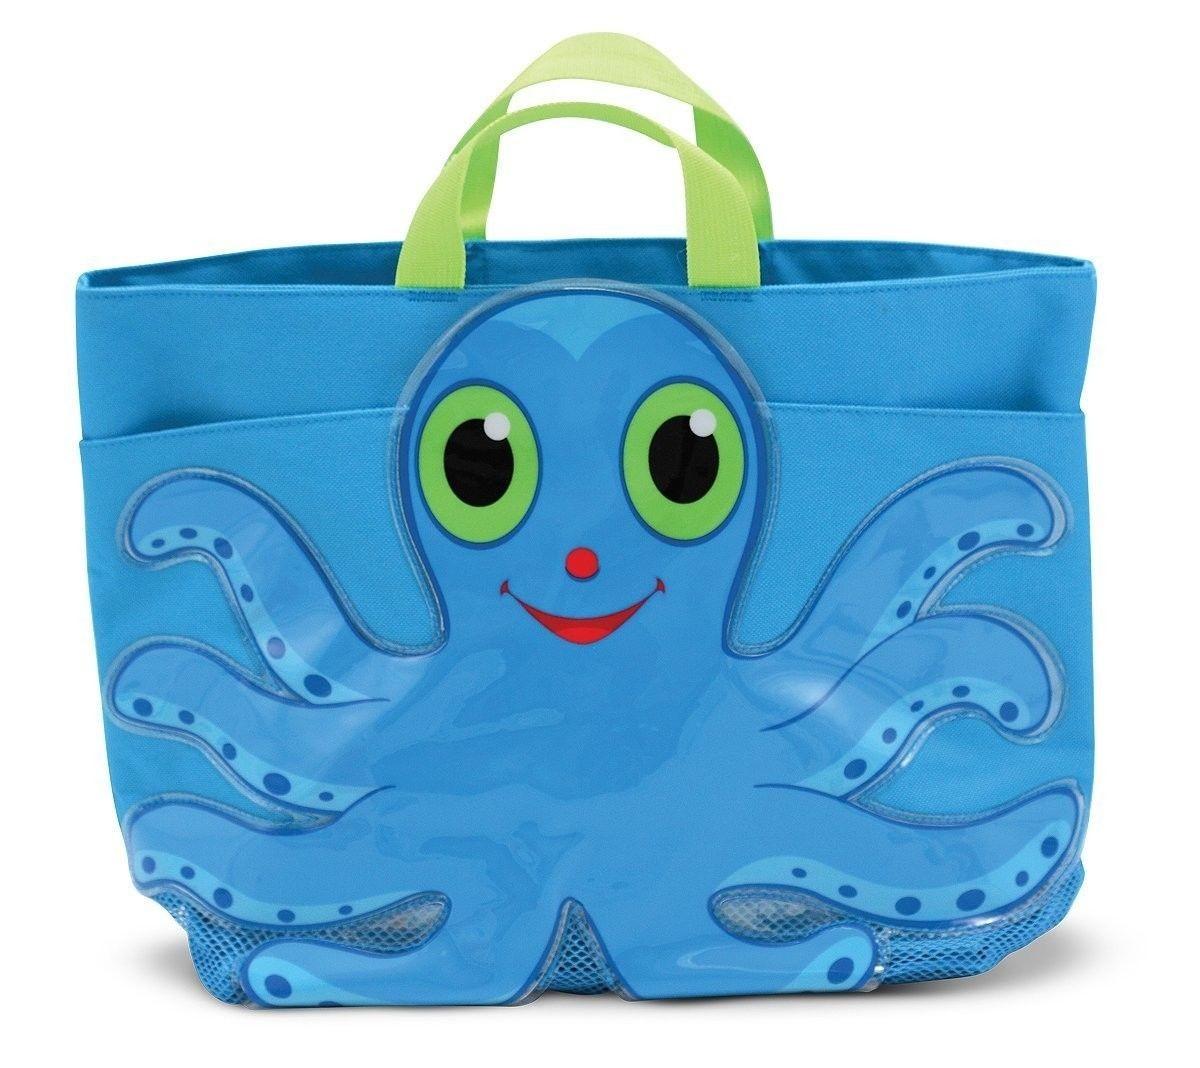 Melissa and doug flex Octopus Tote Beach Bag